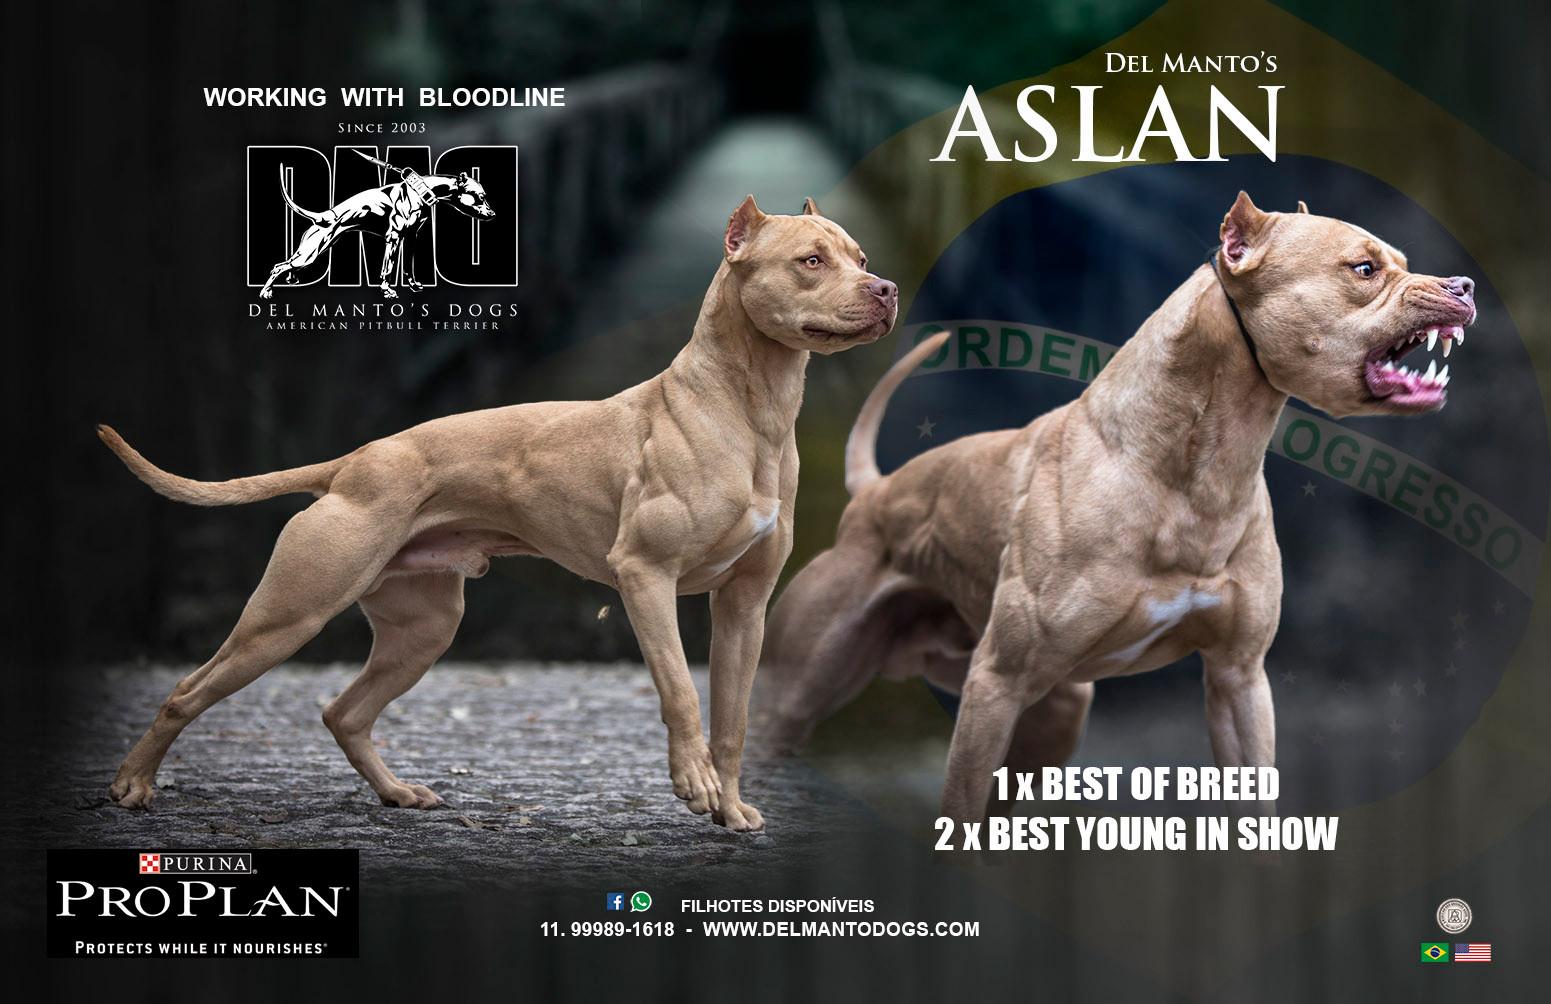 ff28f3524f American Pit Bull Terrier